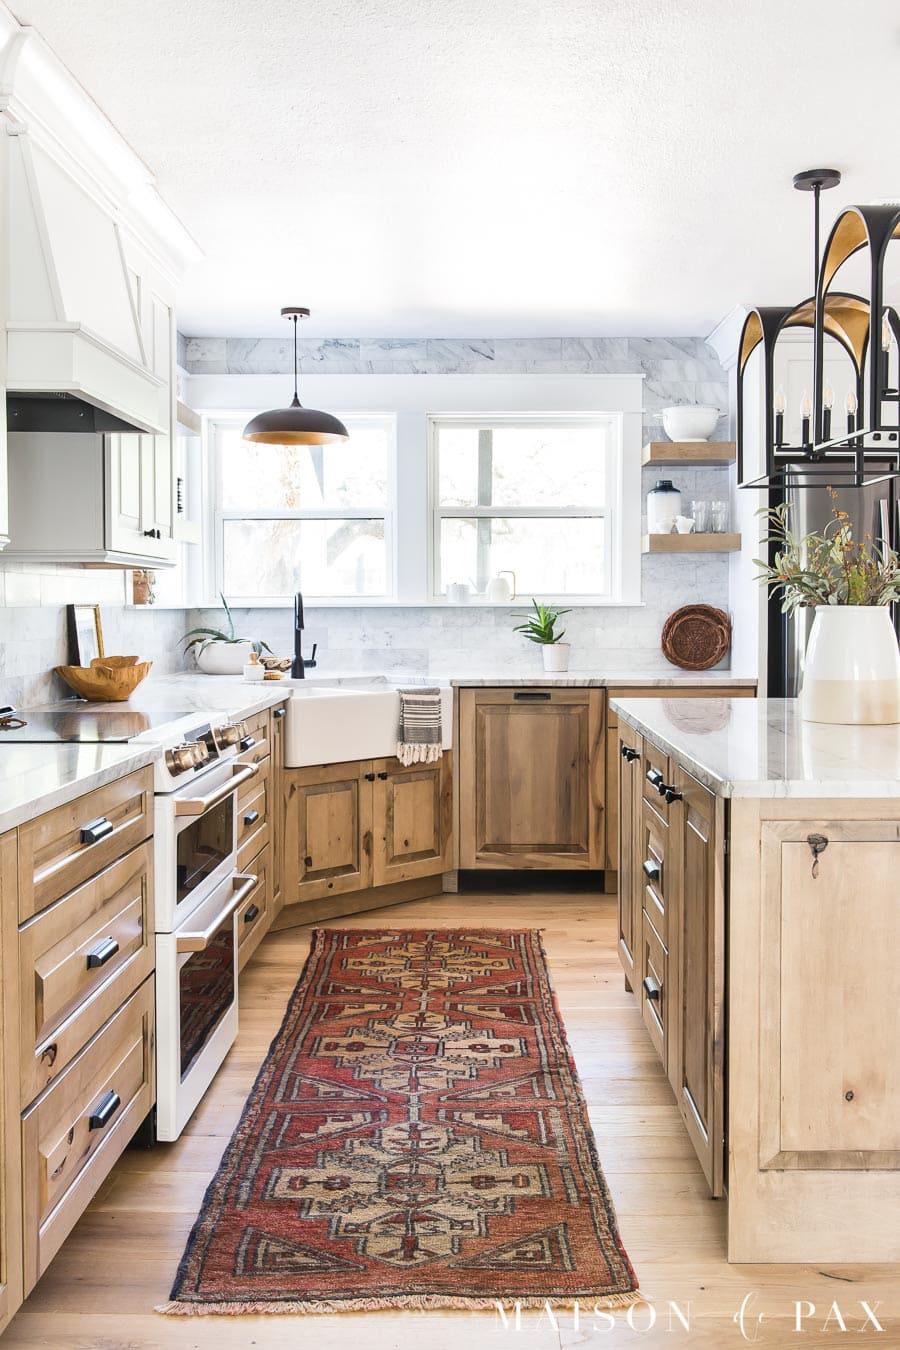 natural wood cabinets with marble backsplash